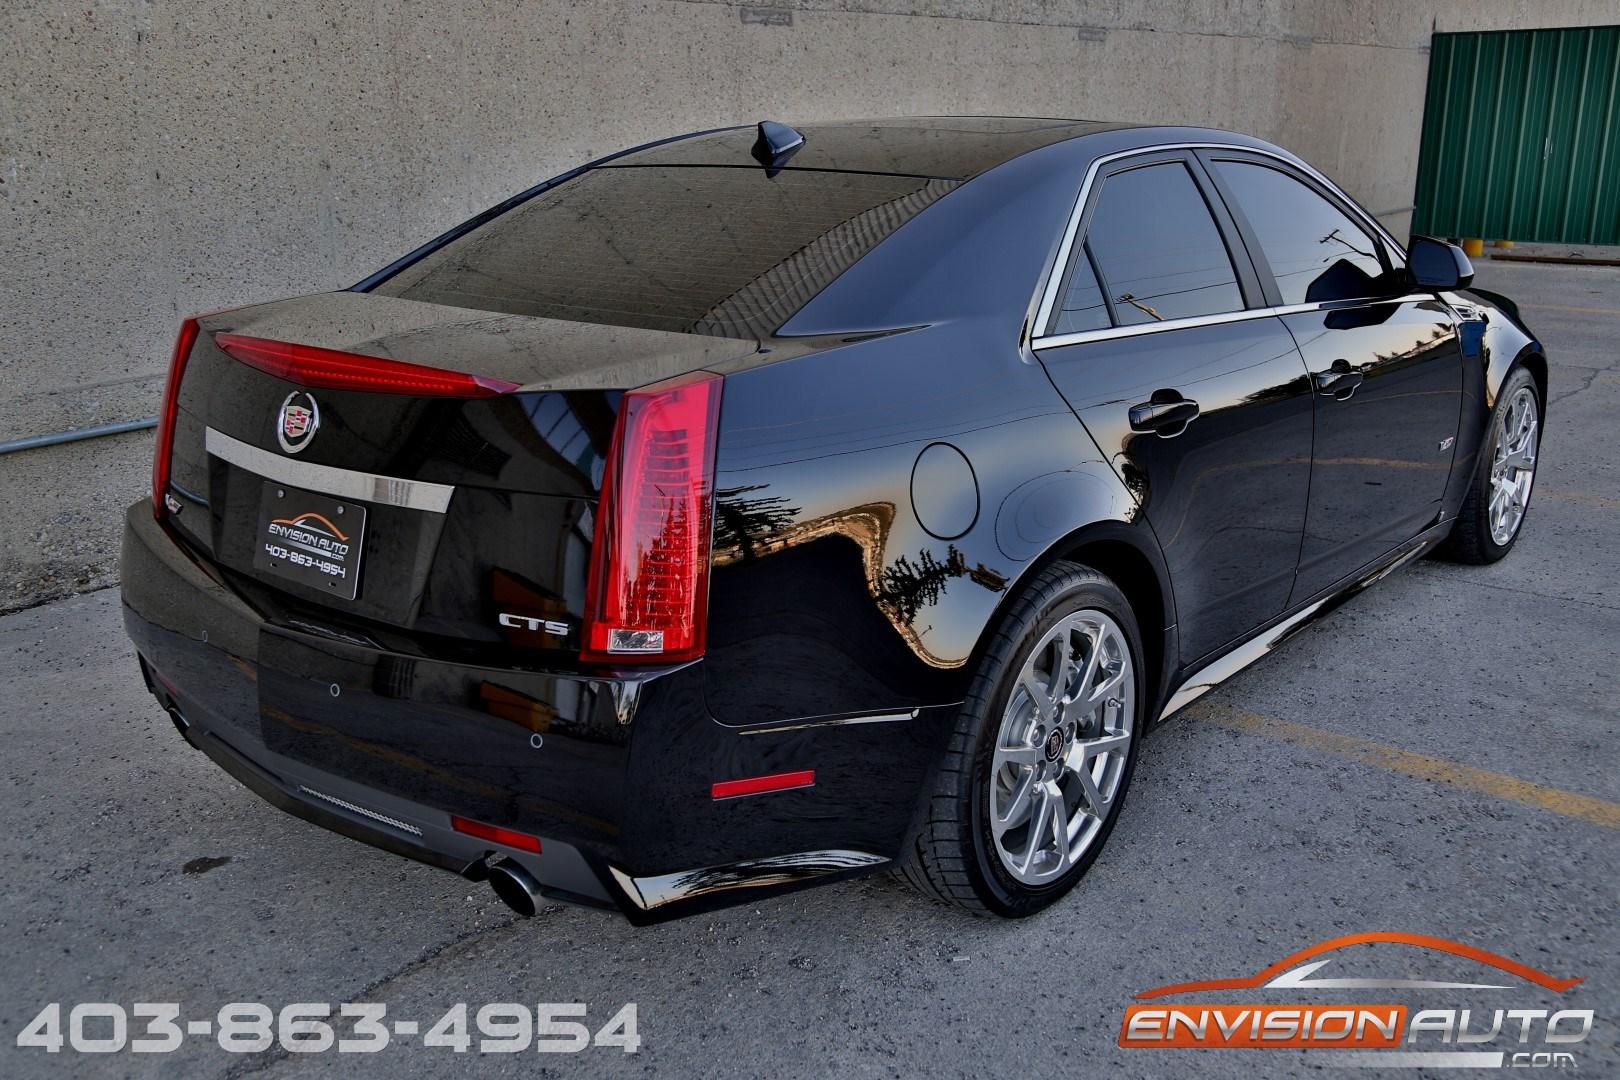 2009 Cadillac Cts V Sedan 556hp Envision Auto